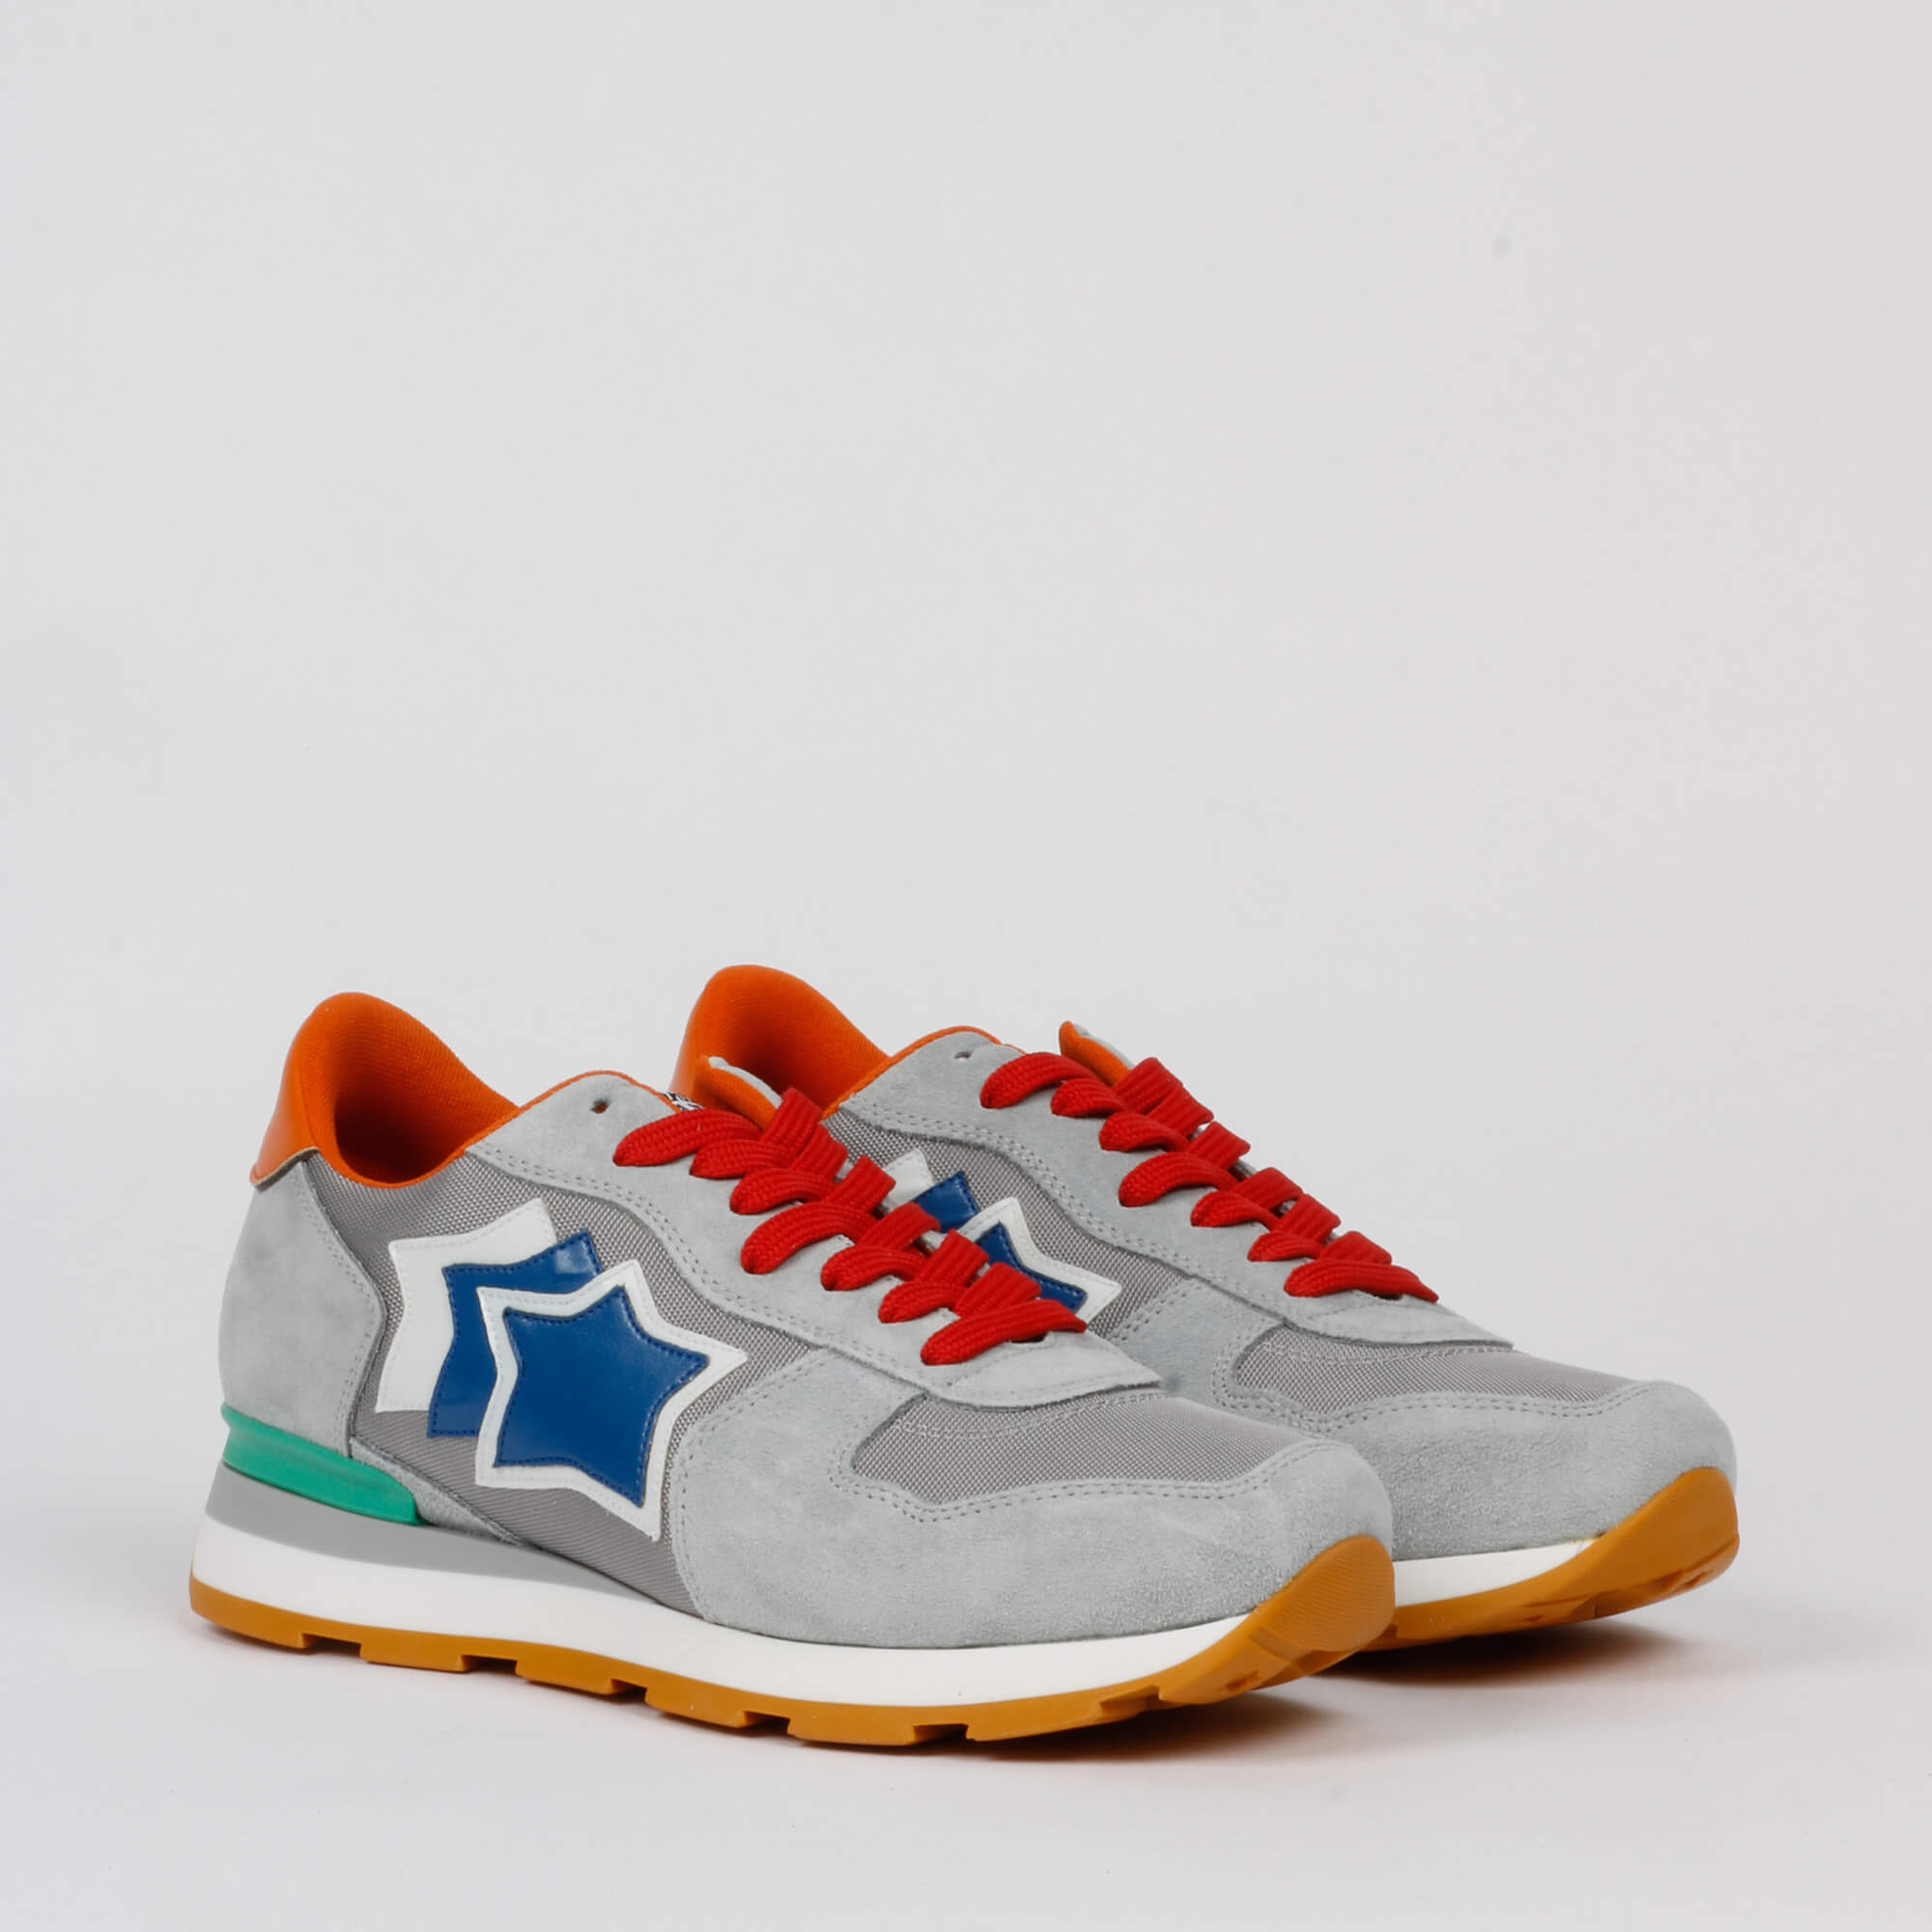 Sneakers antar- Grigio chiaro